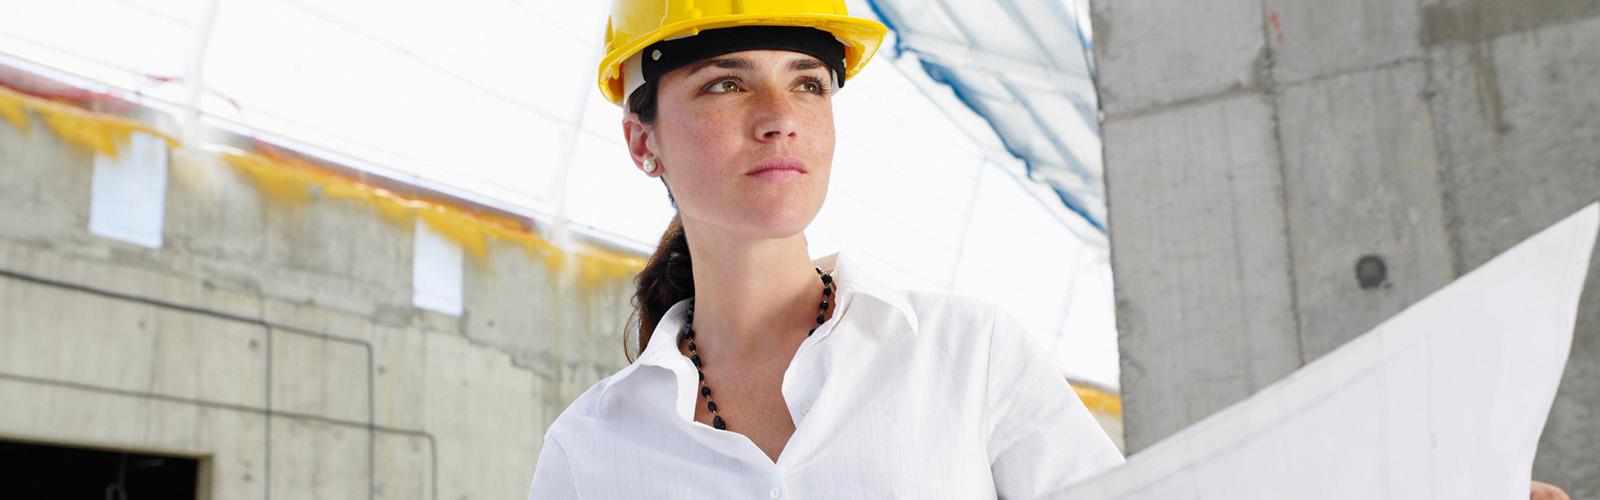 Untitled-1_0004_o-WOMEN-CONSTRUCTION-WORKER-facebook